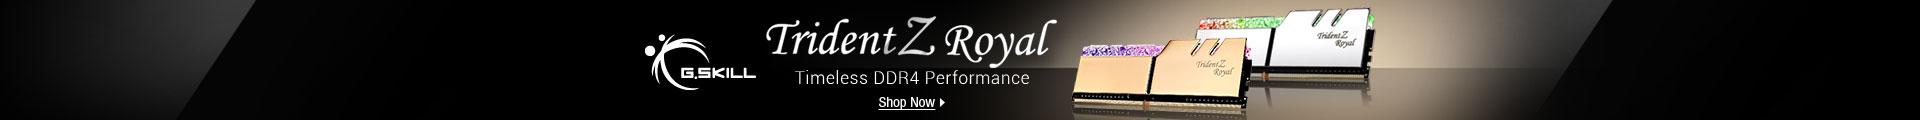 Trident Z royal